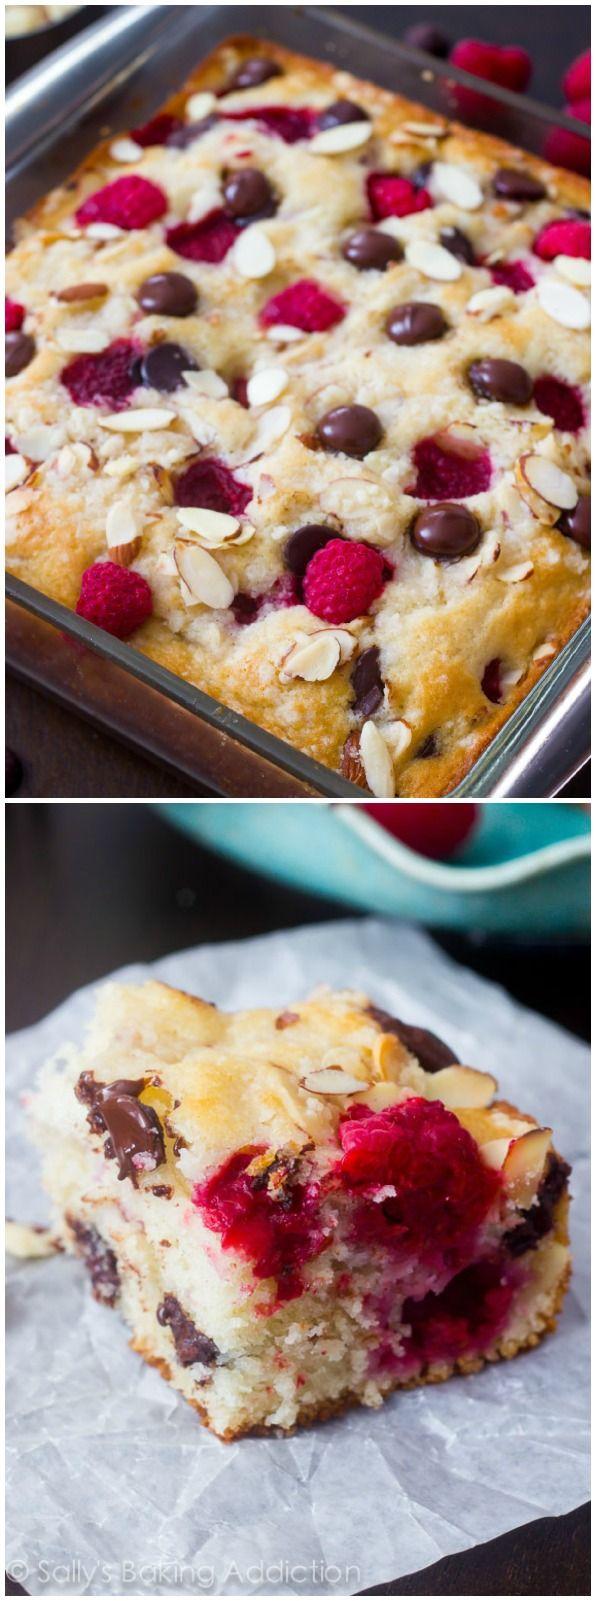 Juicy raspberries and dark chocolate come together in this simple, crowd-pleasing breakfast cake!